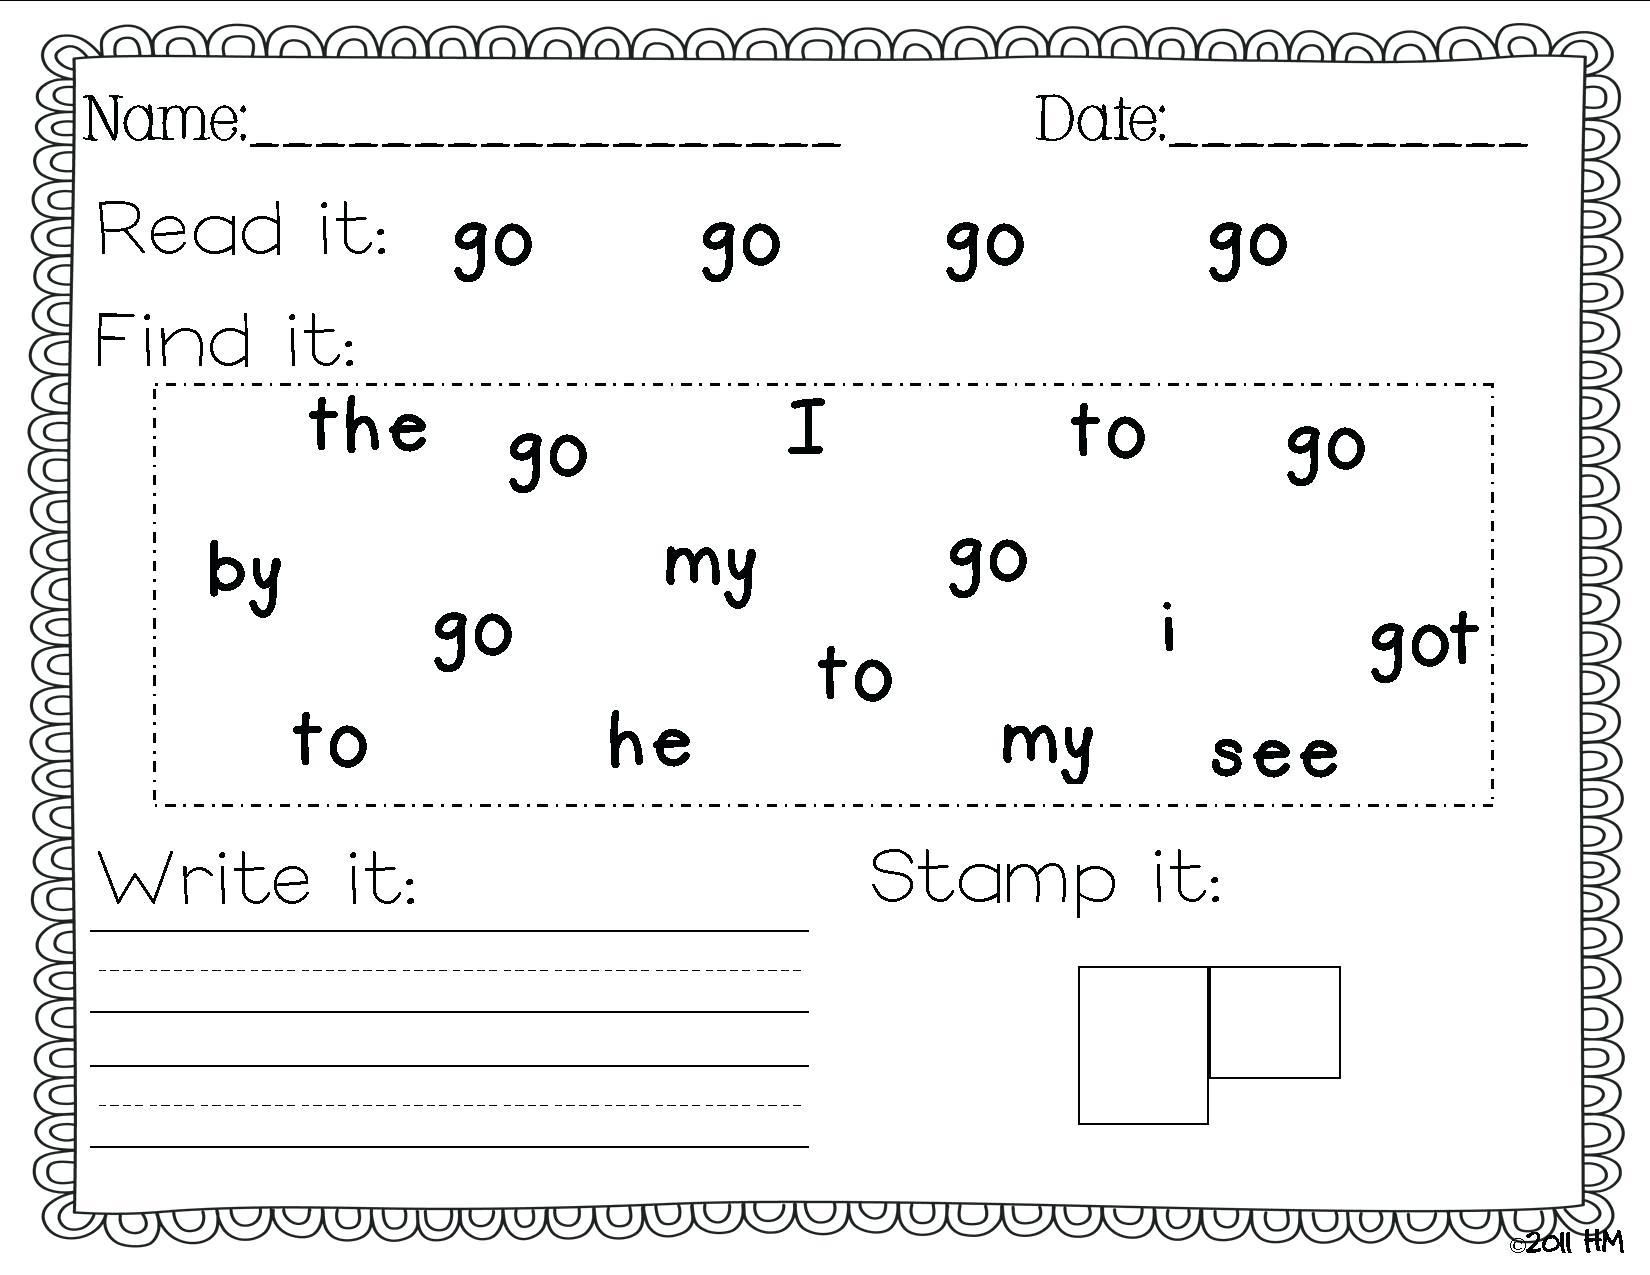 Kinder Handwriting Worksheets – Confrariadacarne.club - Blank Handwriting Worksheets Printable Free